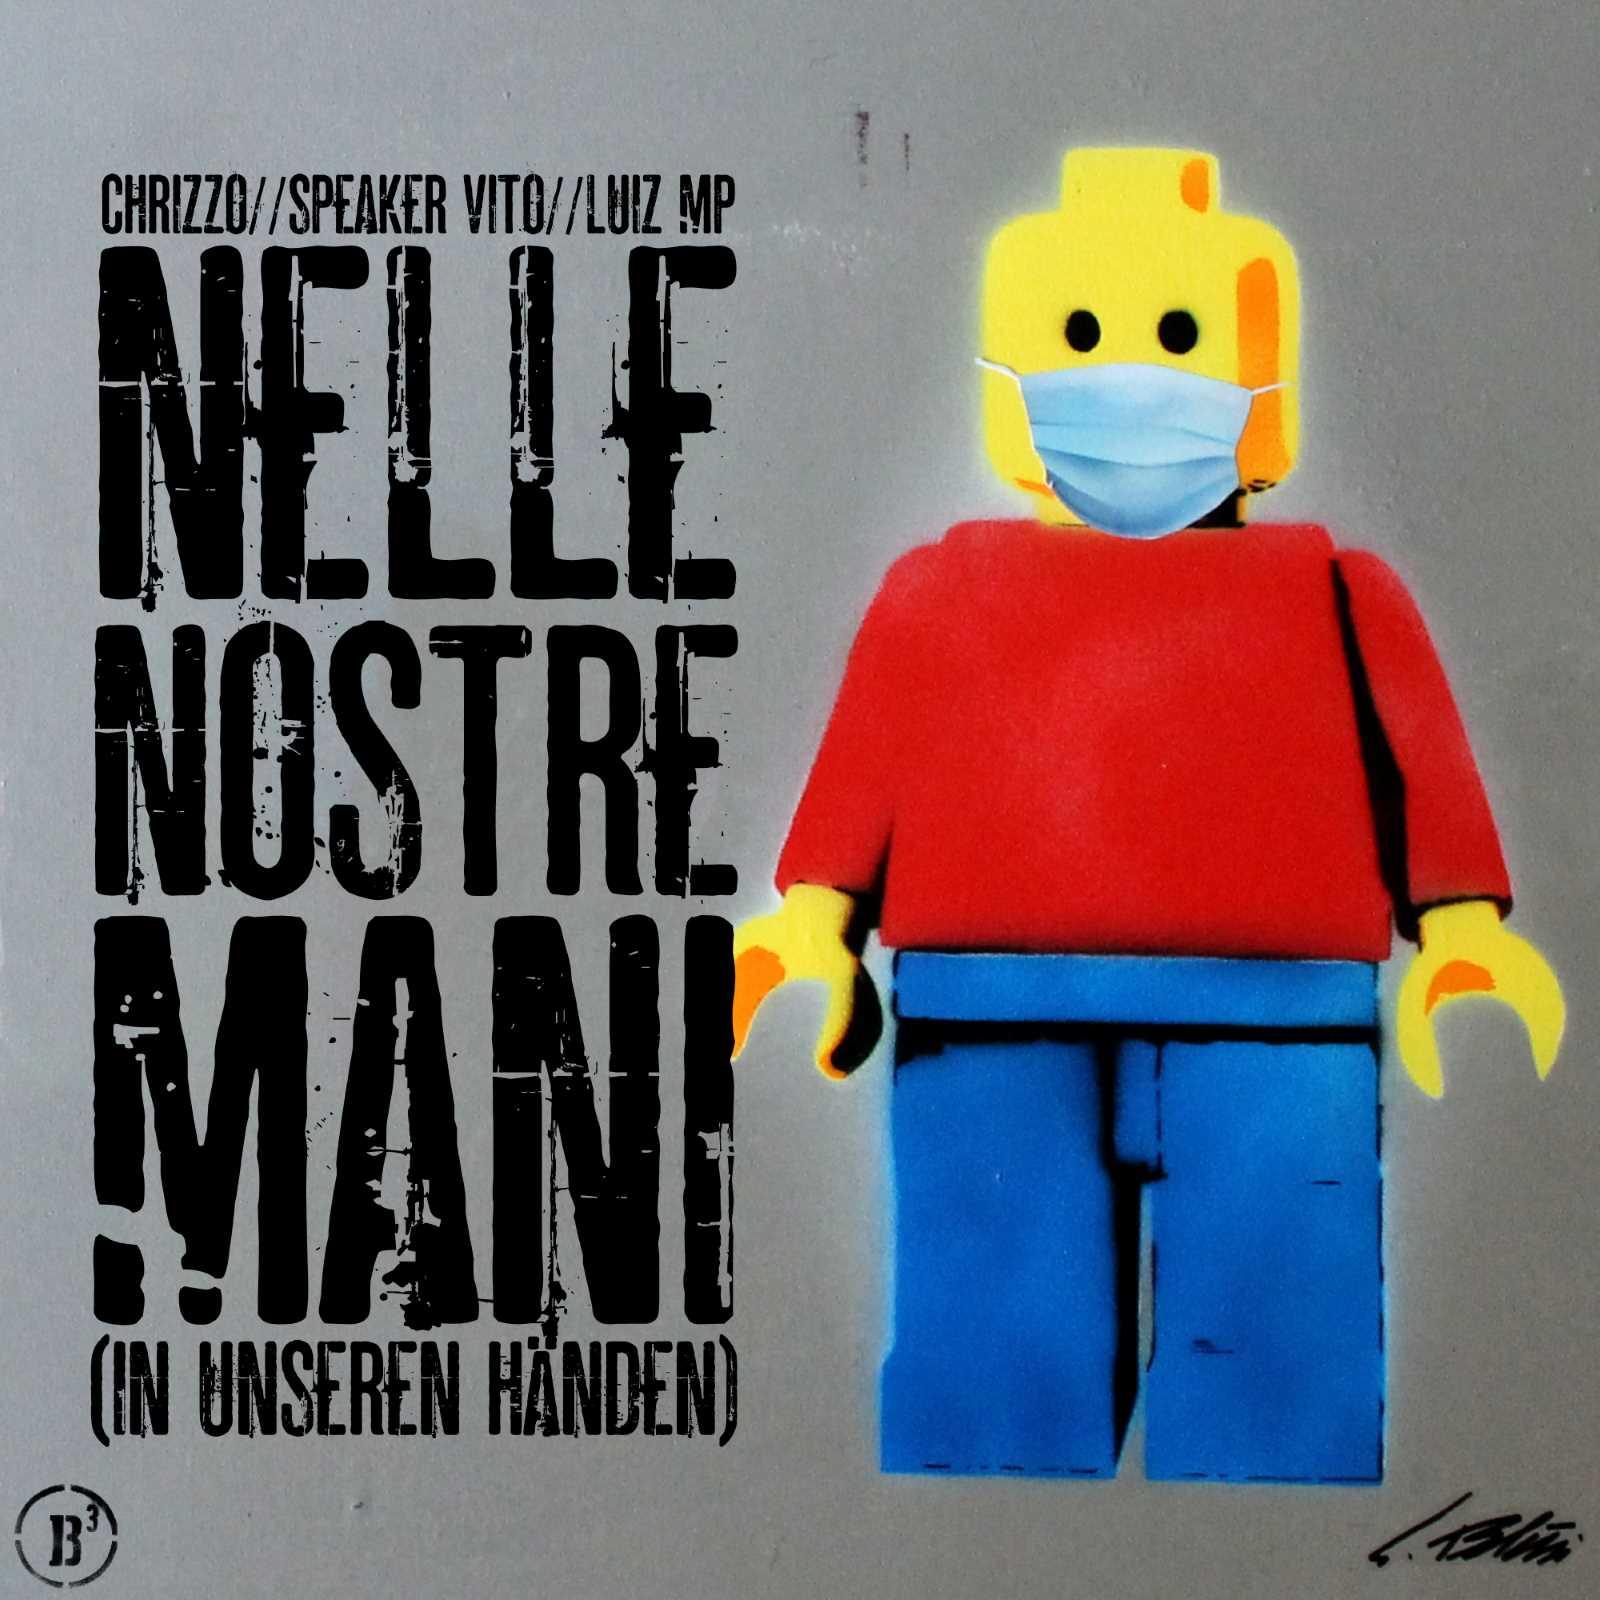 Upcoming: Chrizzo, Speaker Vito, Luiz MP - Nelle Nostre Mani (In Unseren Händen)